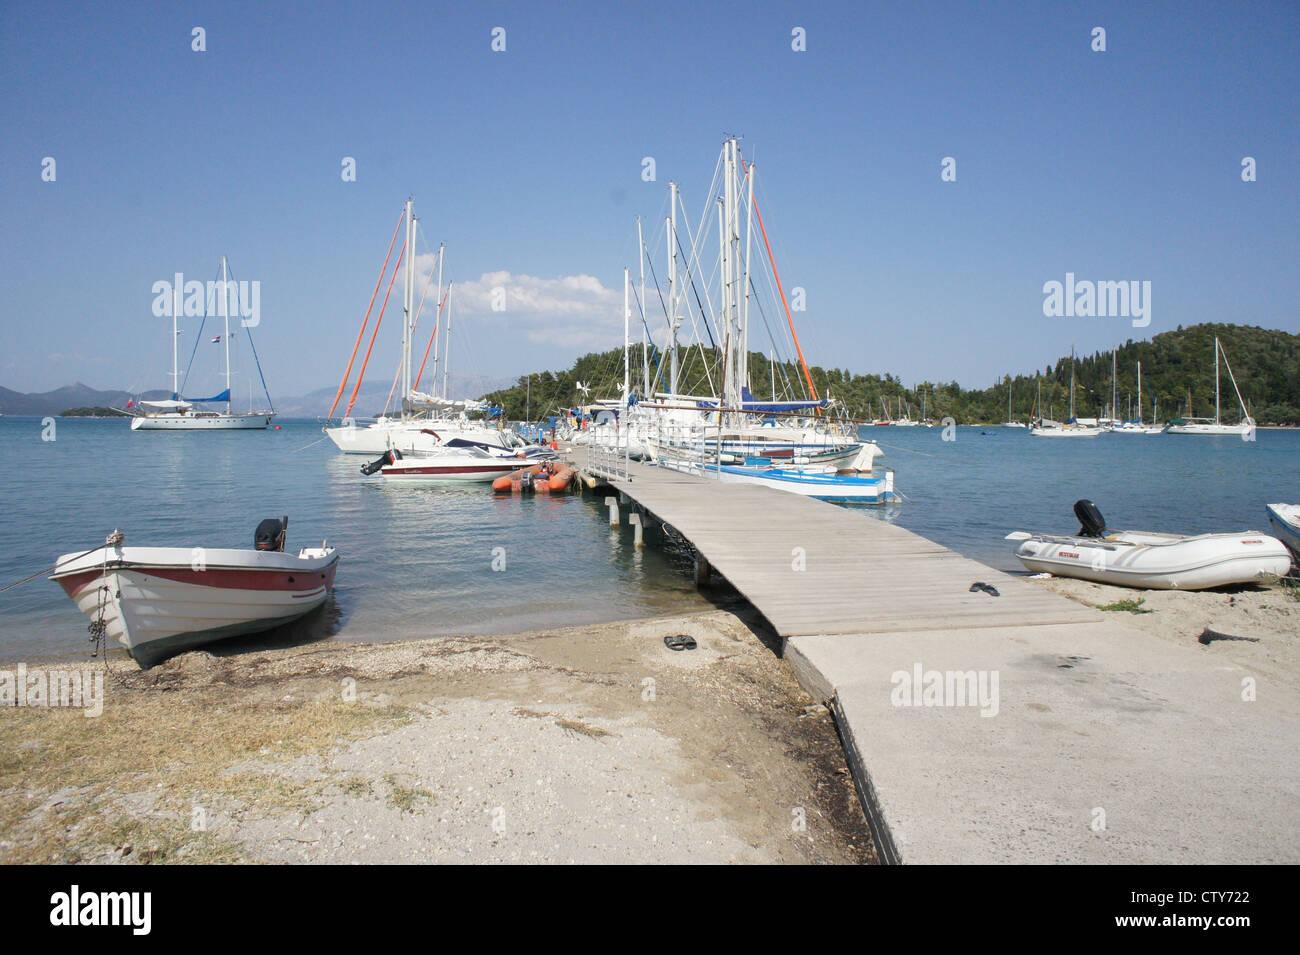 Nidri Harbour, Ionian Islands, Greece - Stock Image